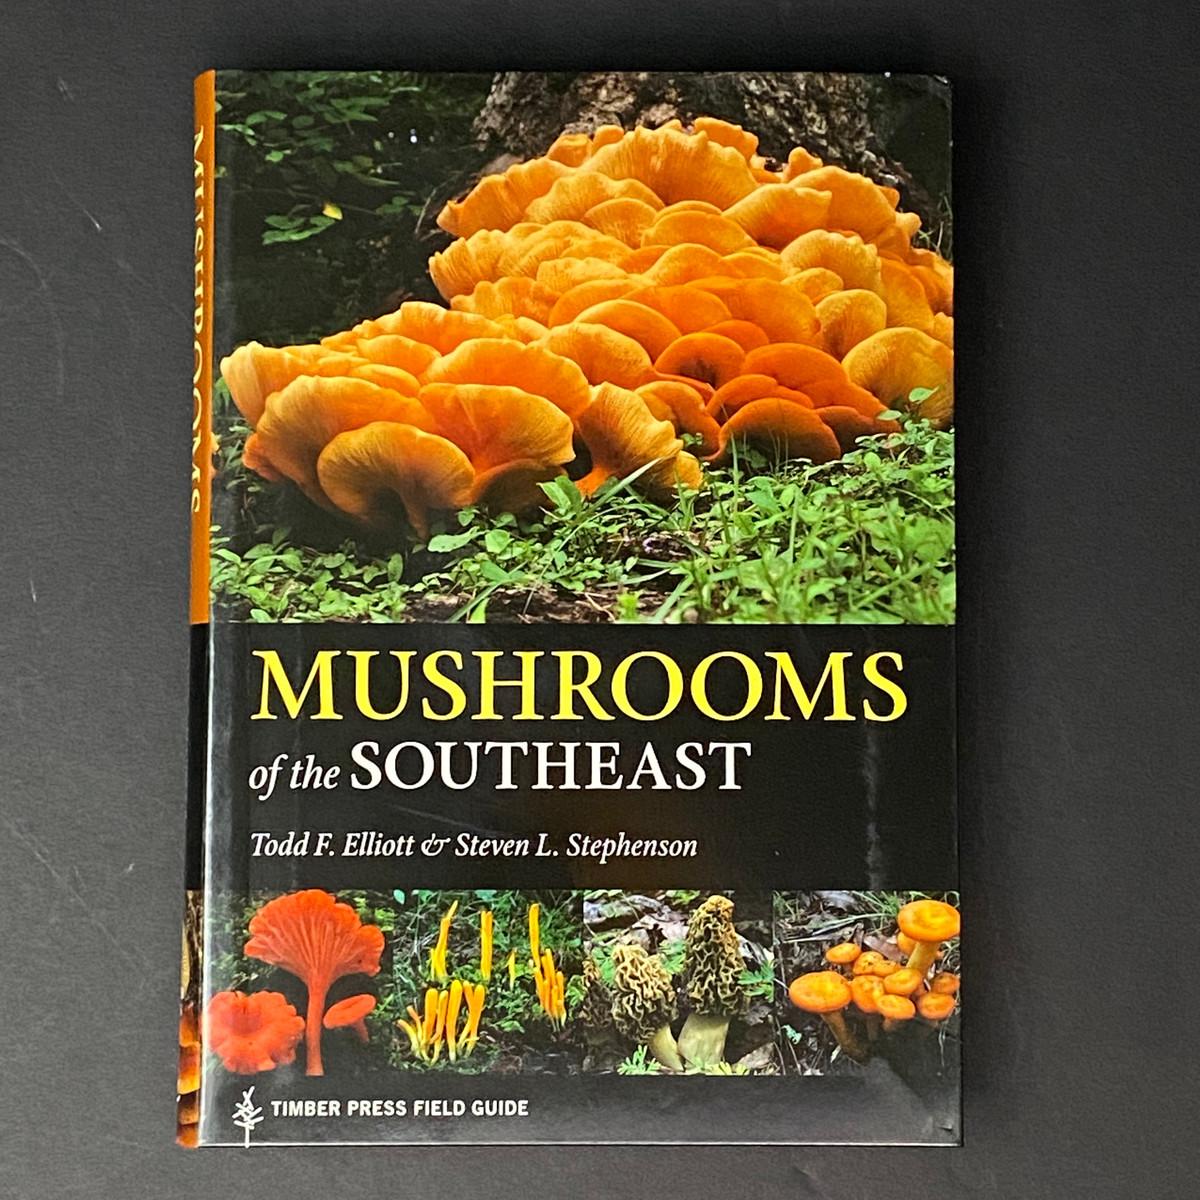 Mushrooms of the Southeast | Todd F. Elliott